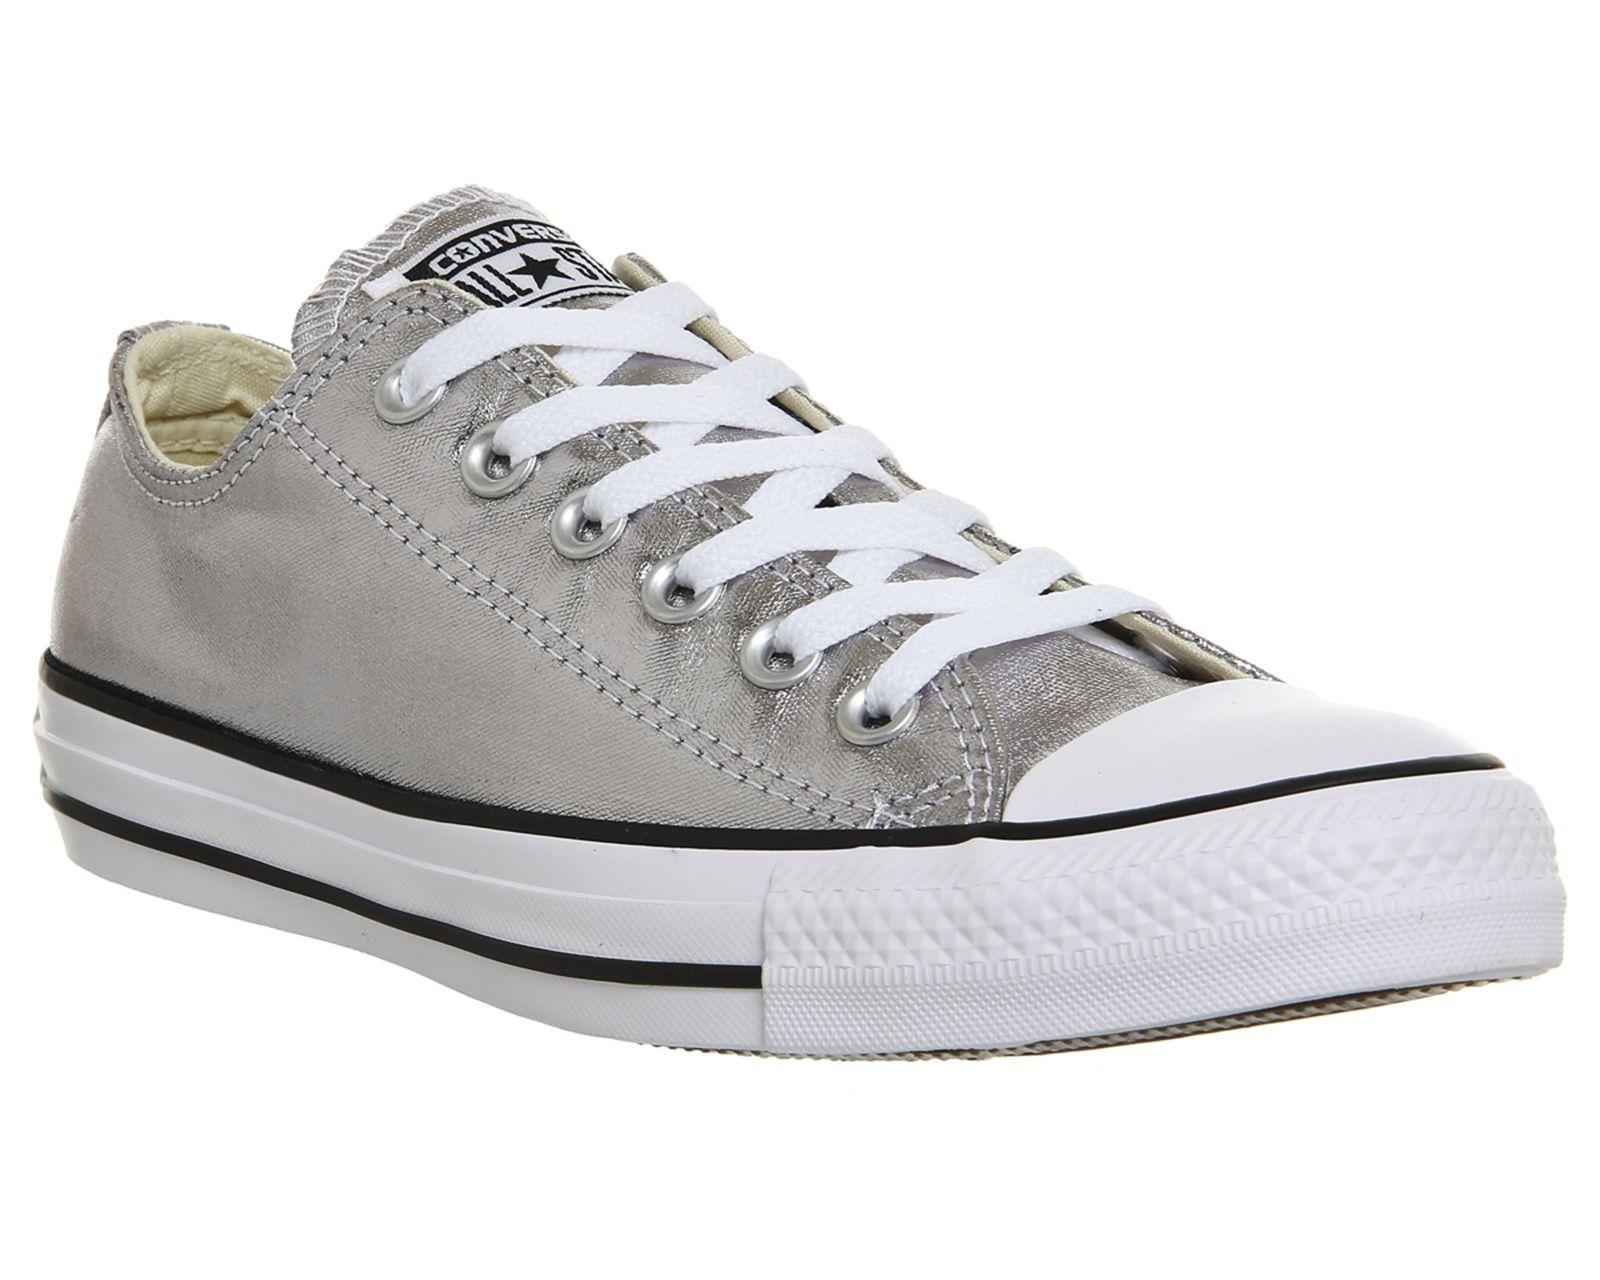 Converse Converse All Star Low Gunmetal Metallic Canvas | Converse ...